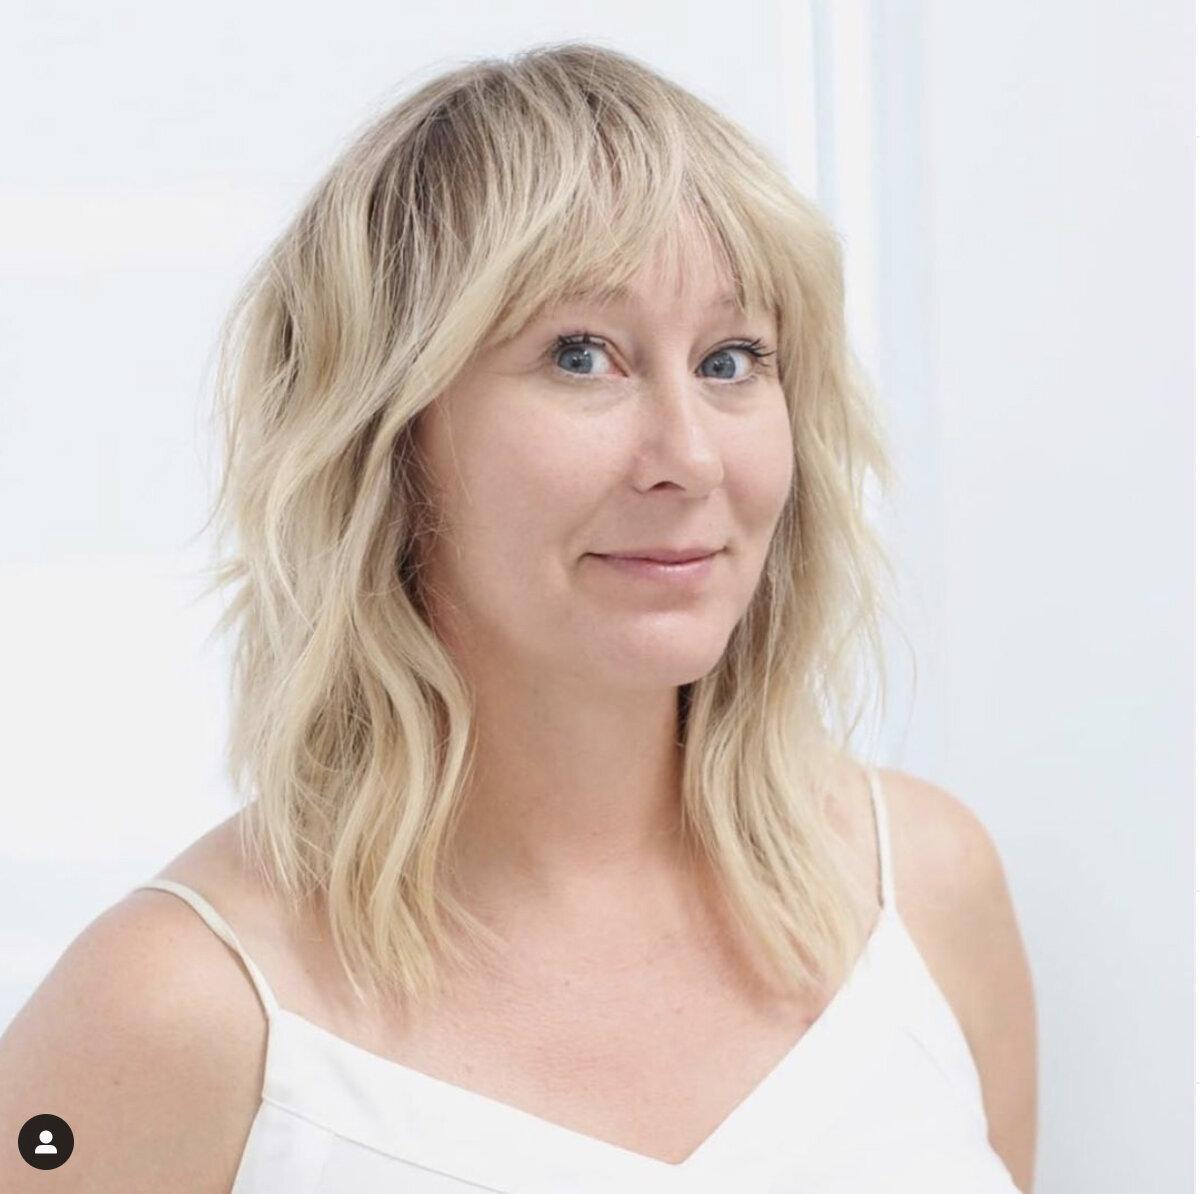 Alison_New_Hair.jpg